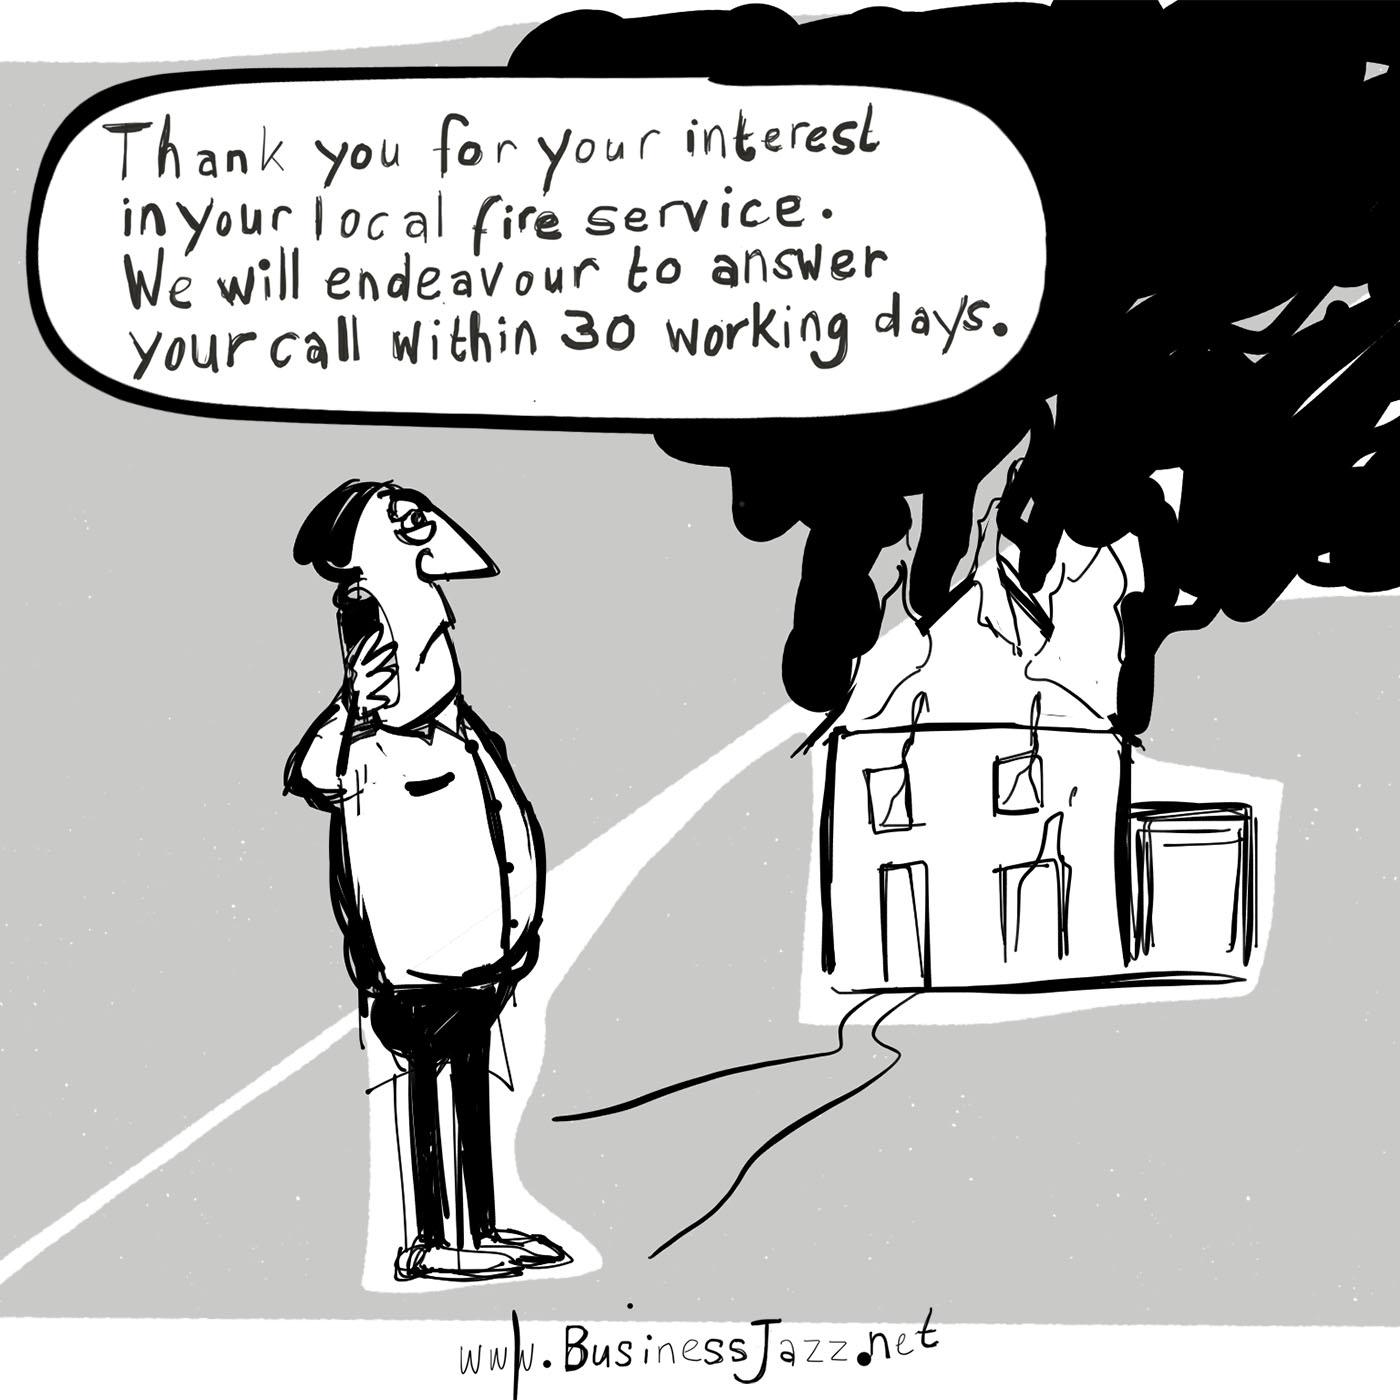 BusinessJazz-S4E3-Cartoon.jpg